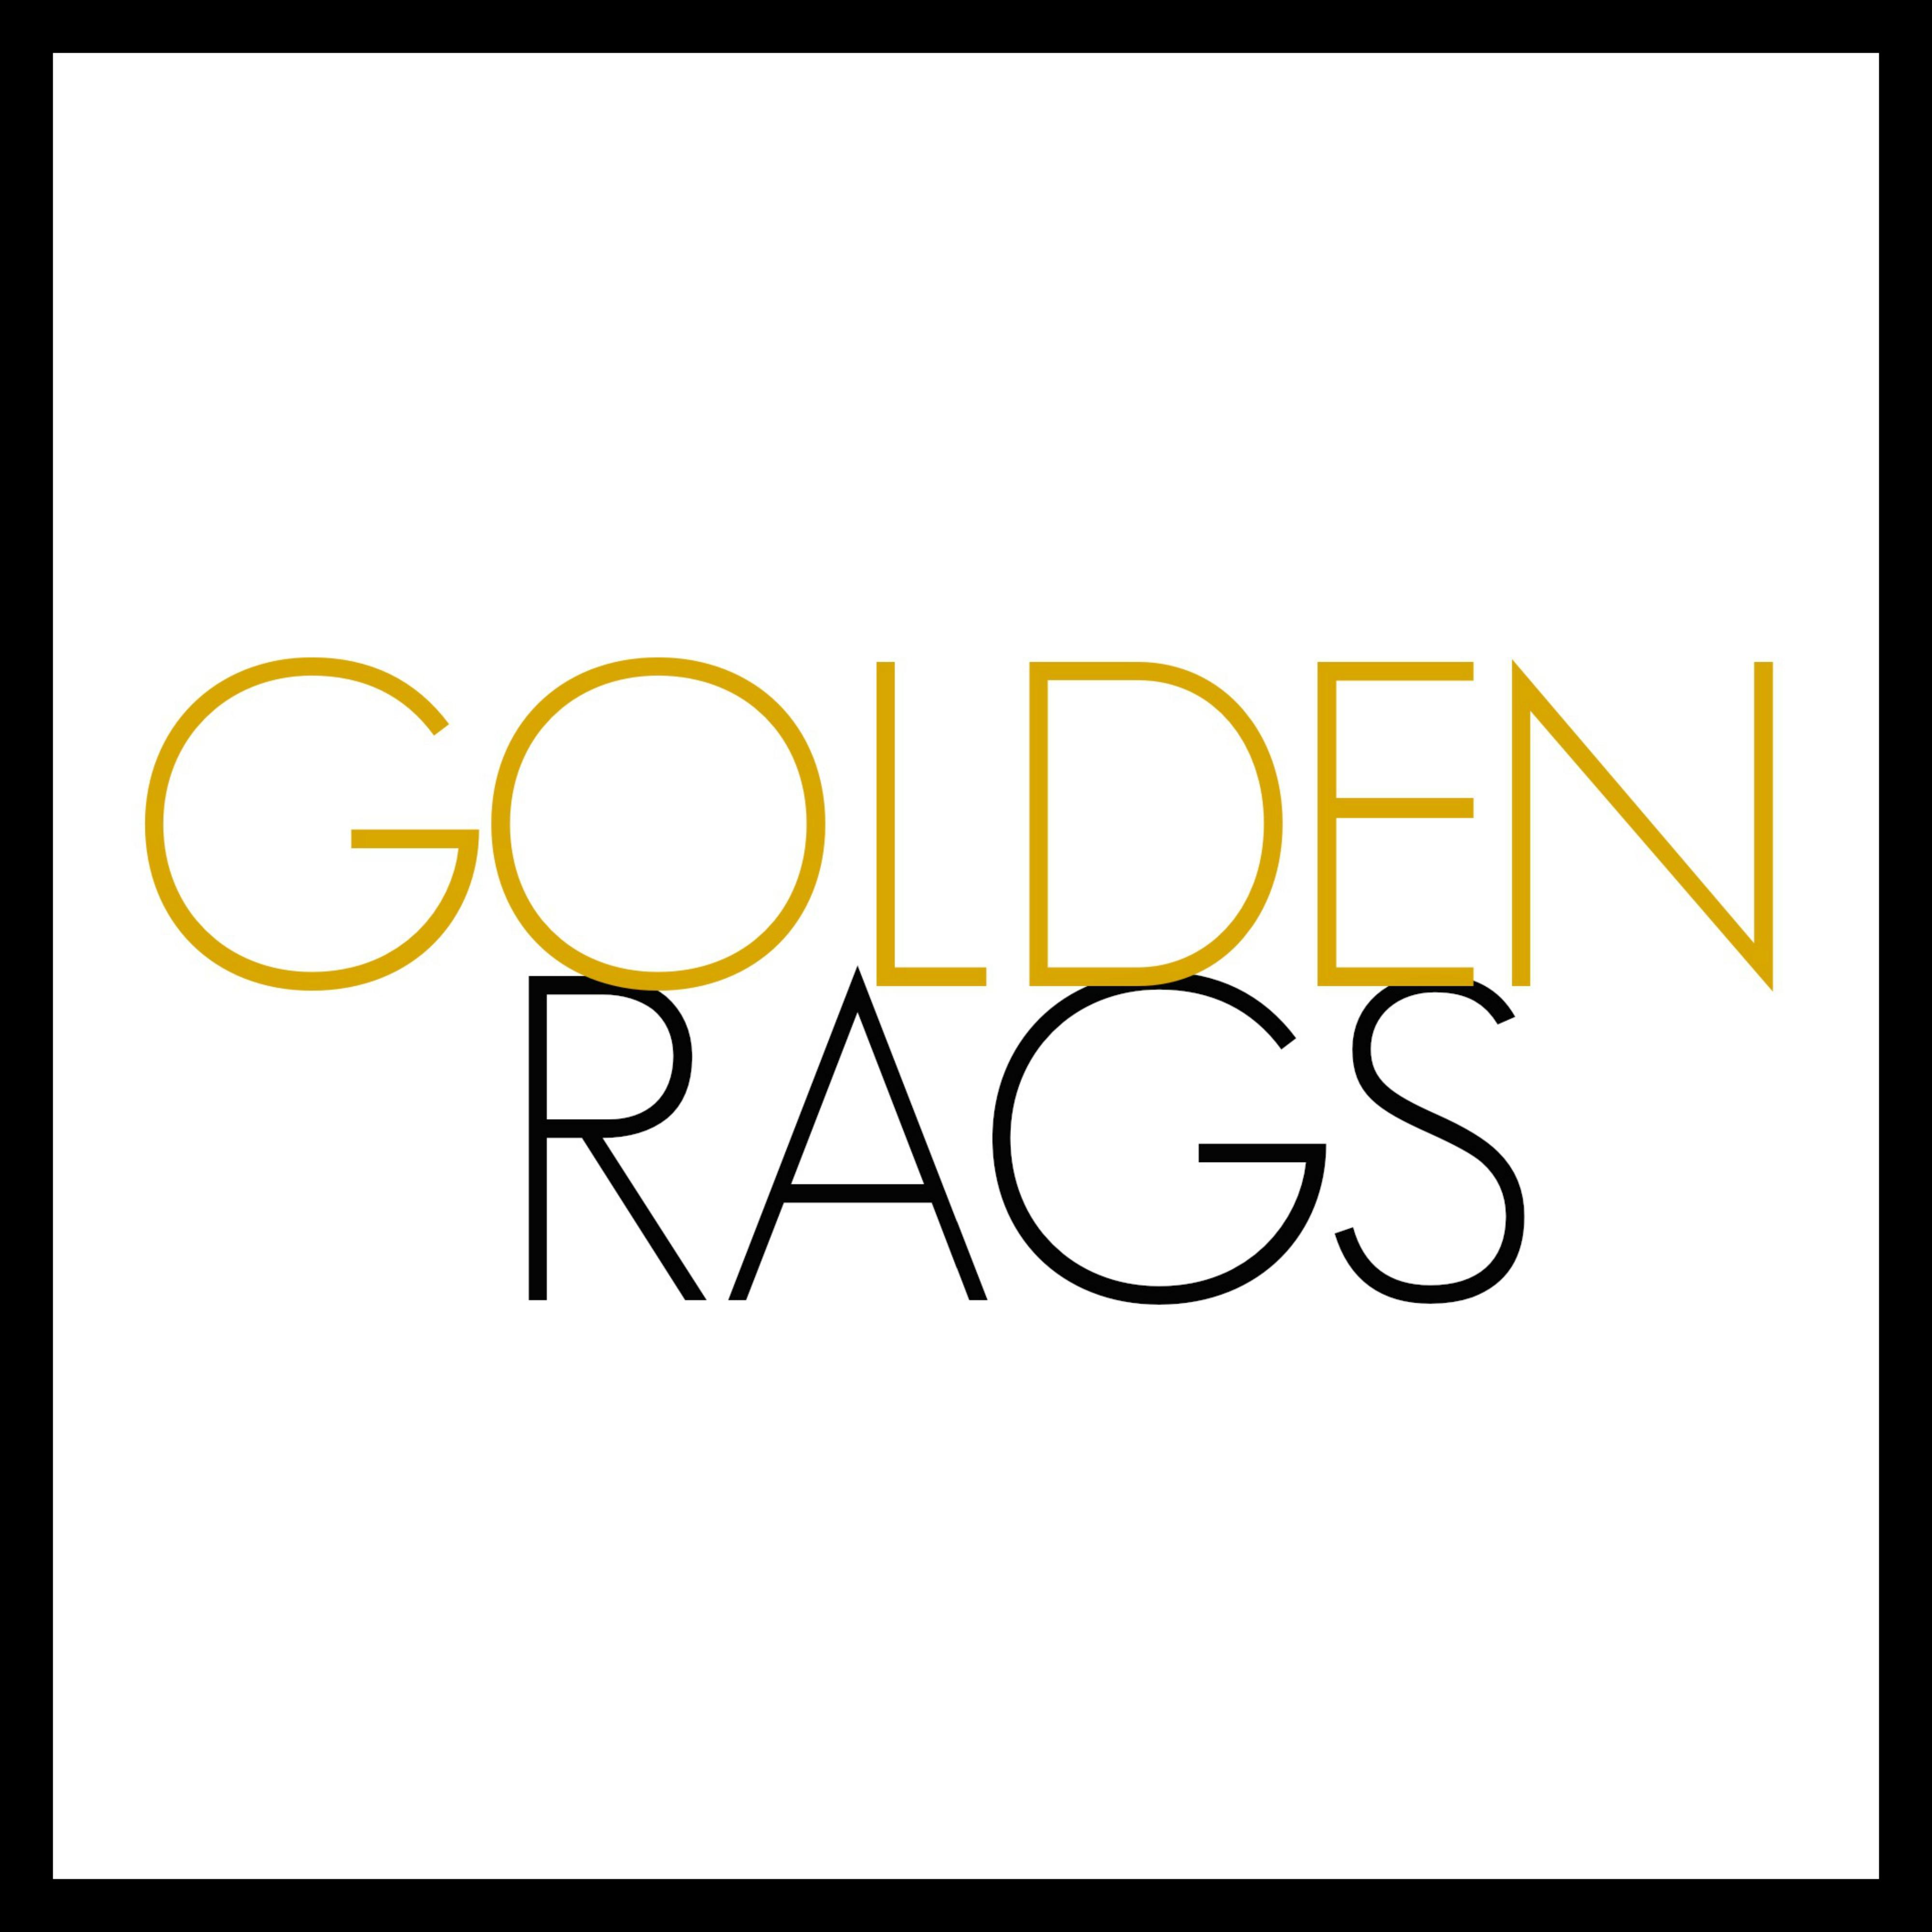 Golden Rags Llc Intern For Fashion Entrepreneur In La